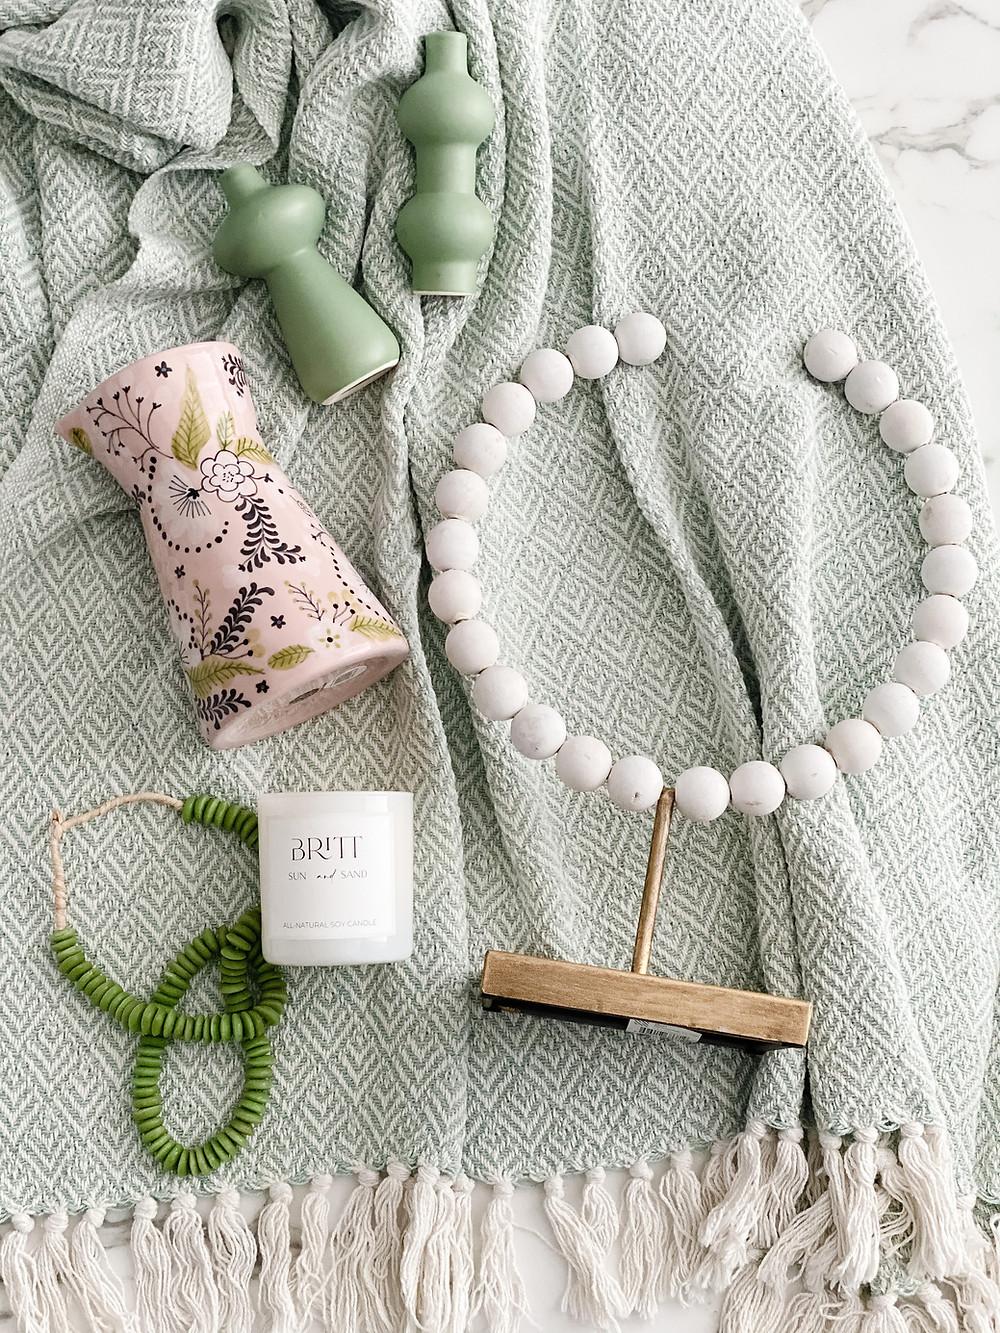 Spring Britt Box accessories